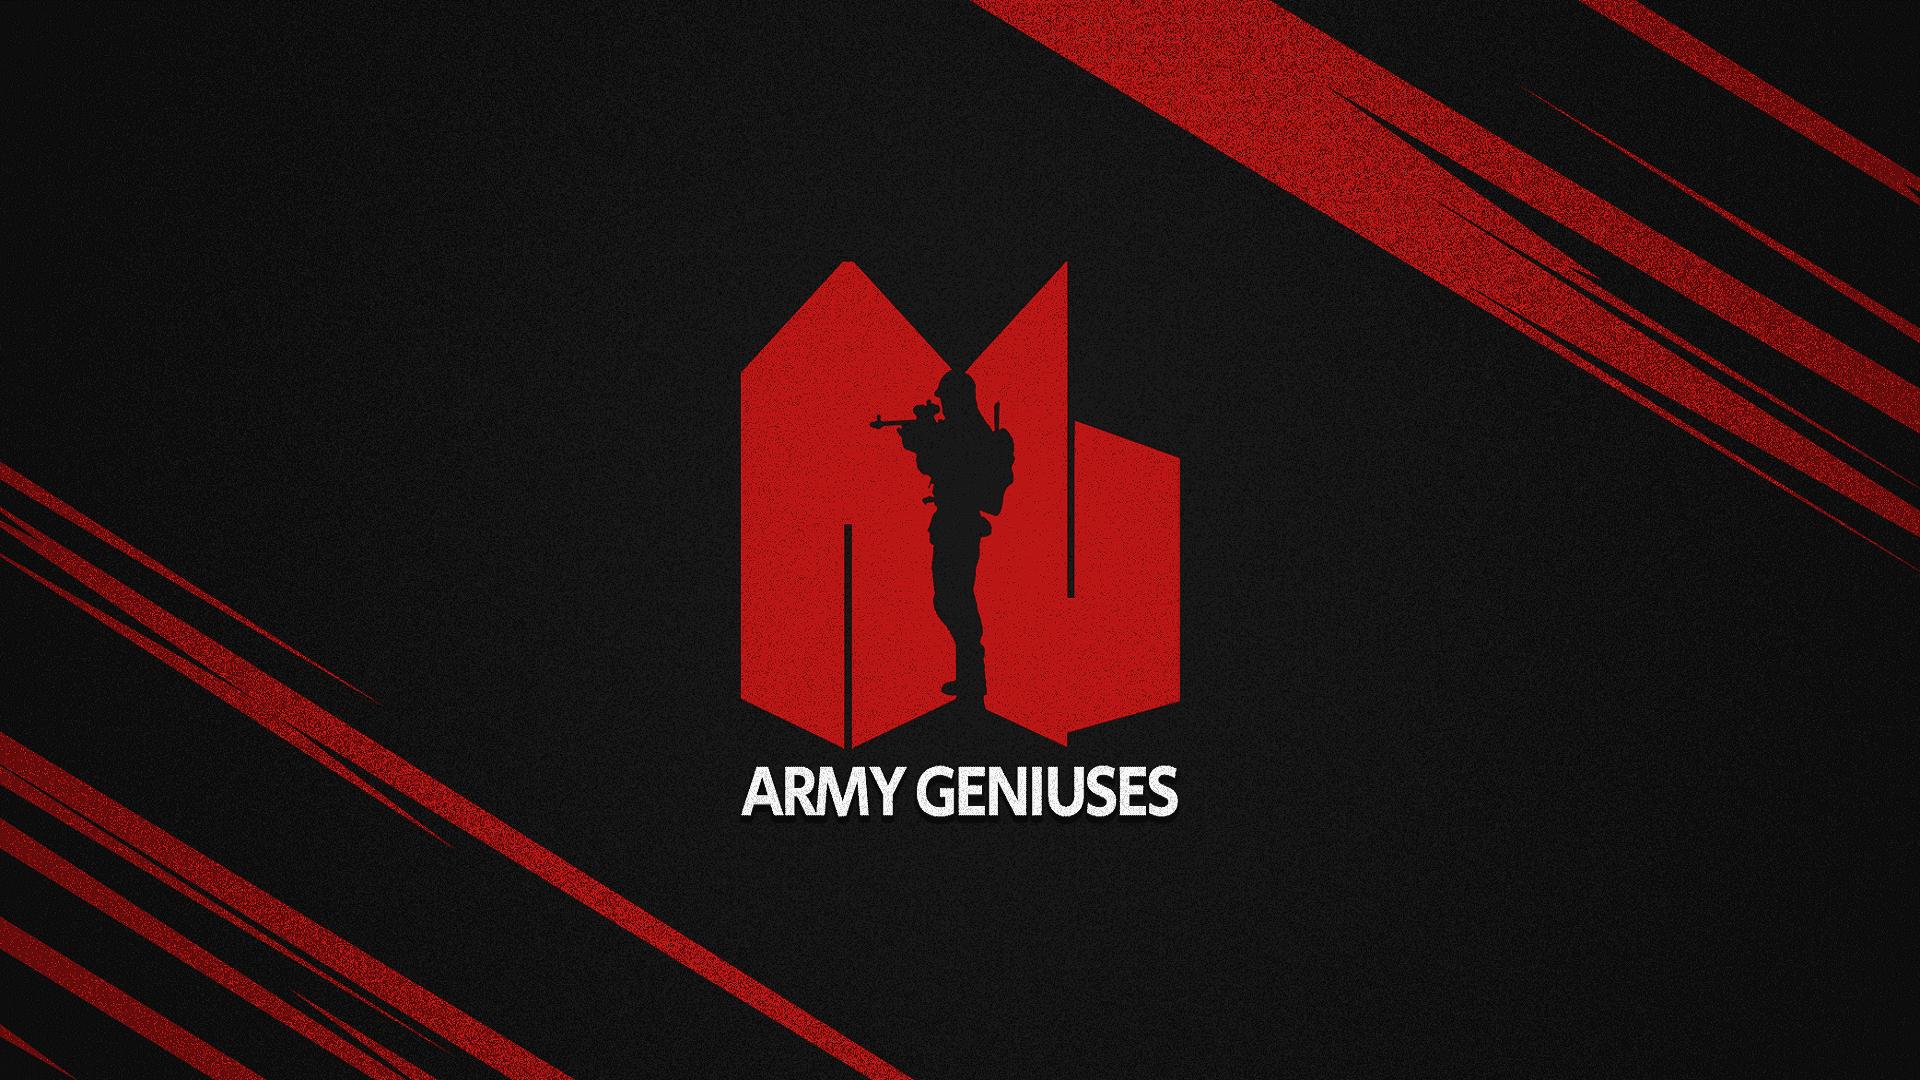 Team Wallpaper - Army Geniuses, Season 2, #1